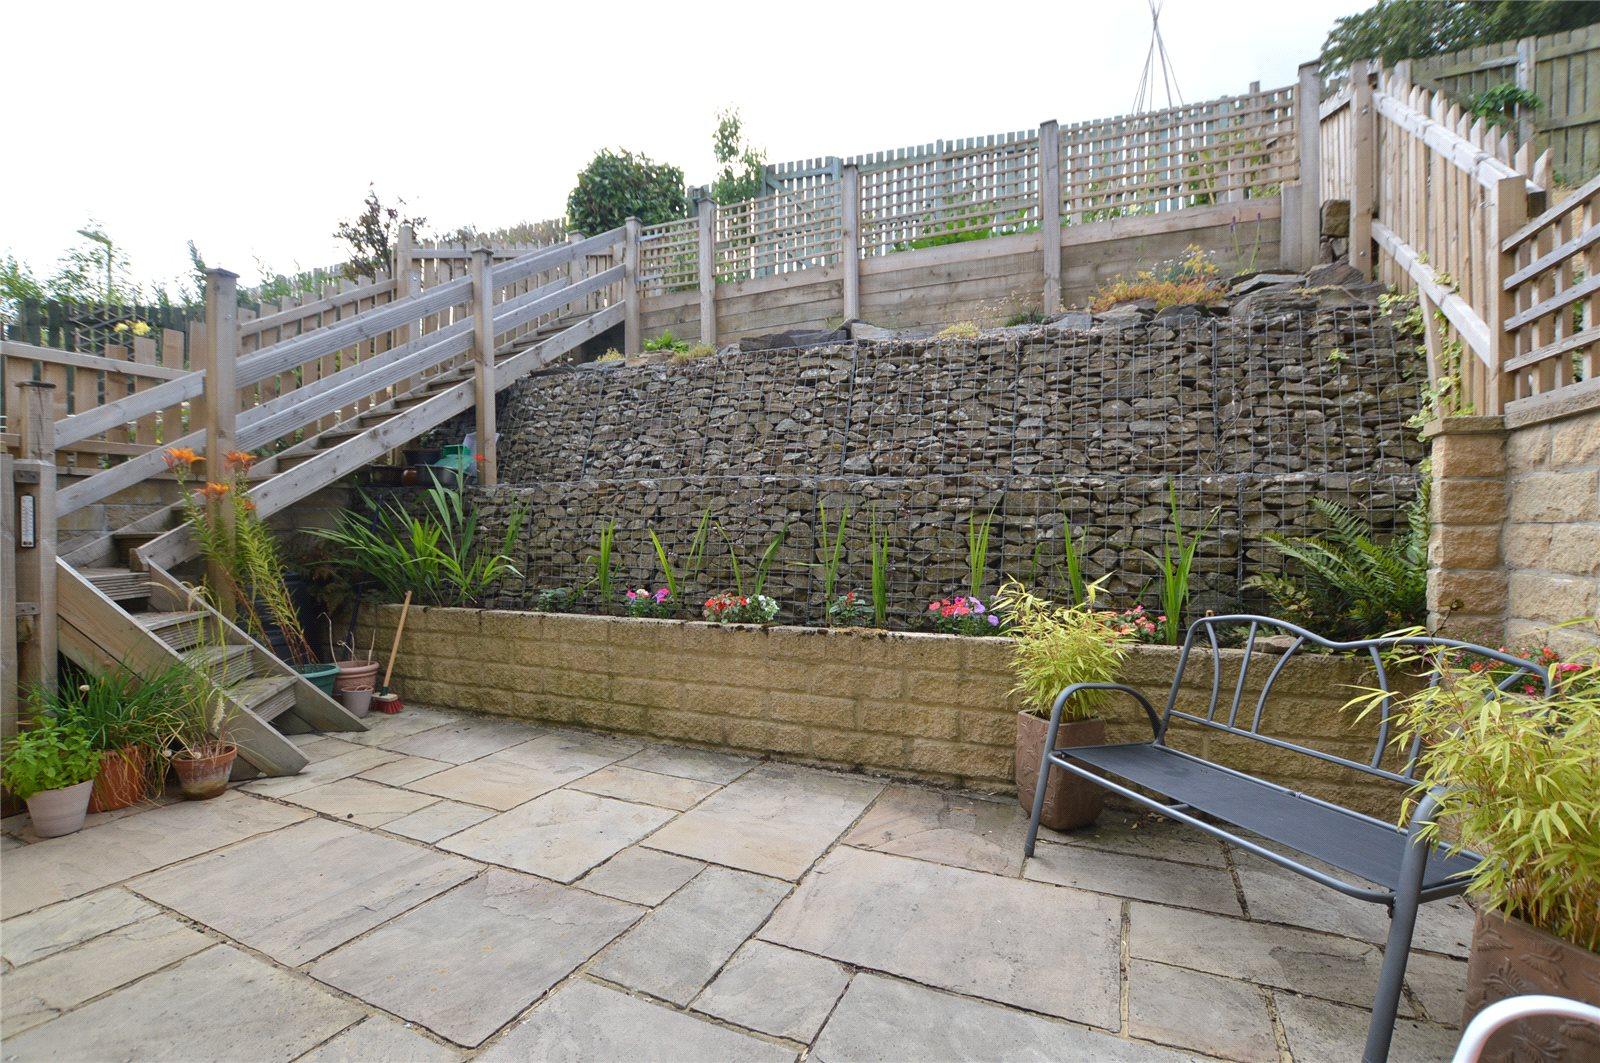 property for sale in Morley, outdoor garden, coutyard